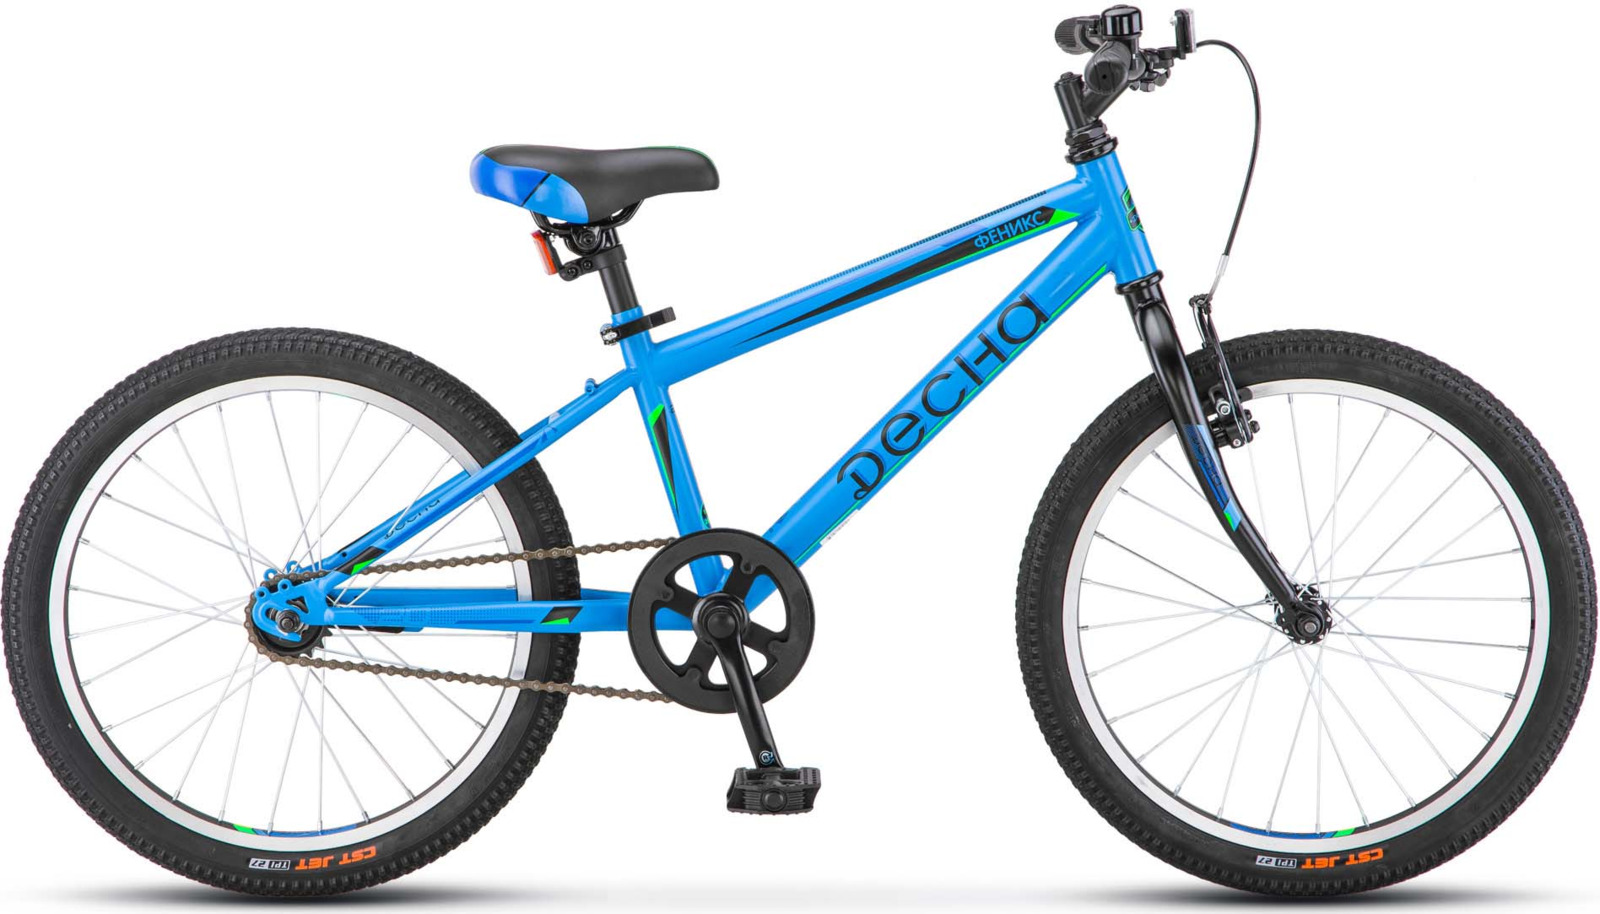 Велосипед Stels Десна Феникс 11, KUBC0045622017, синий